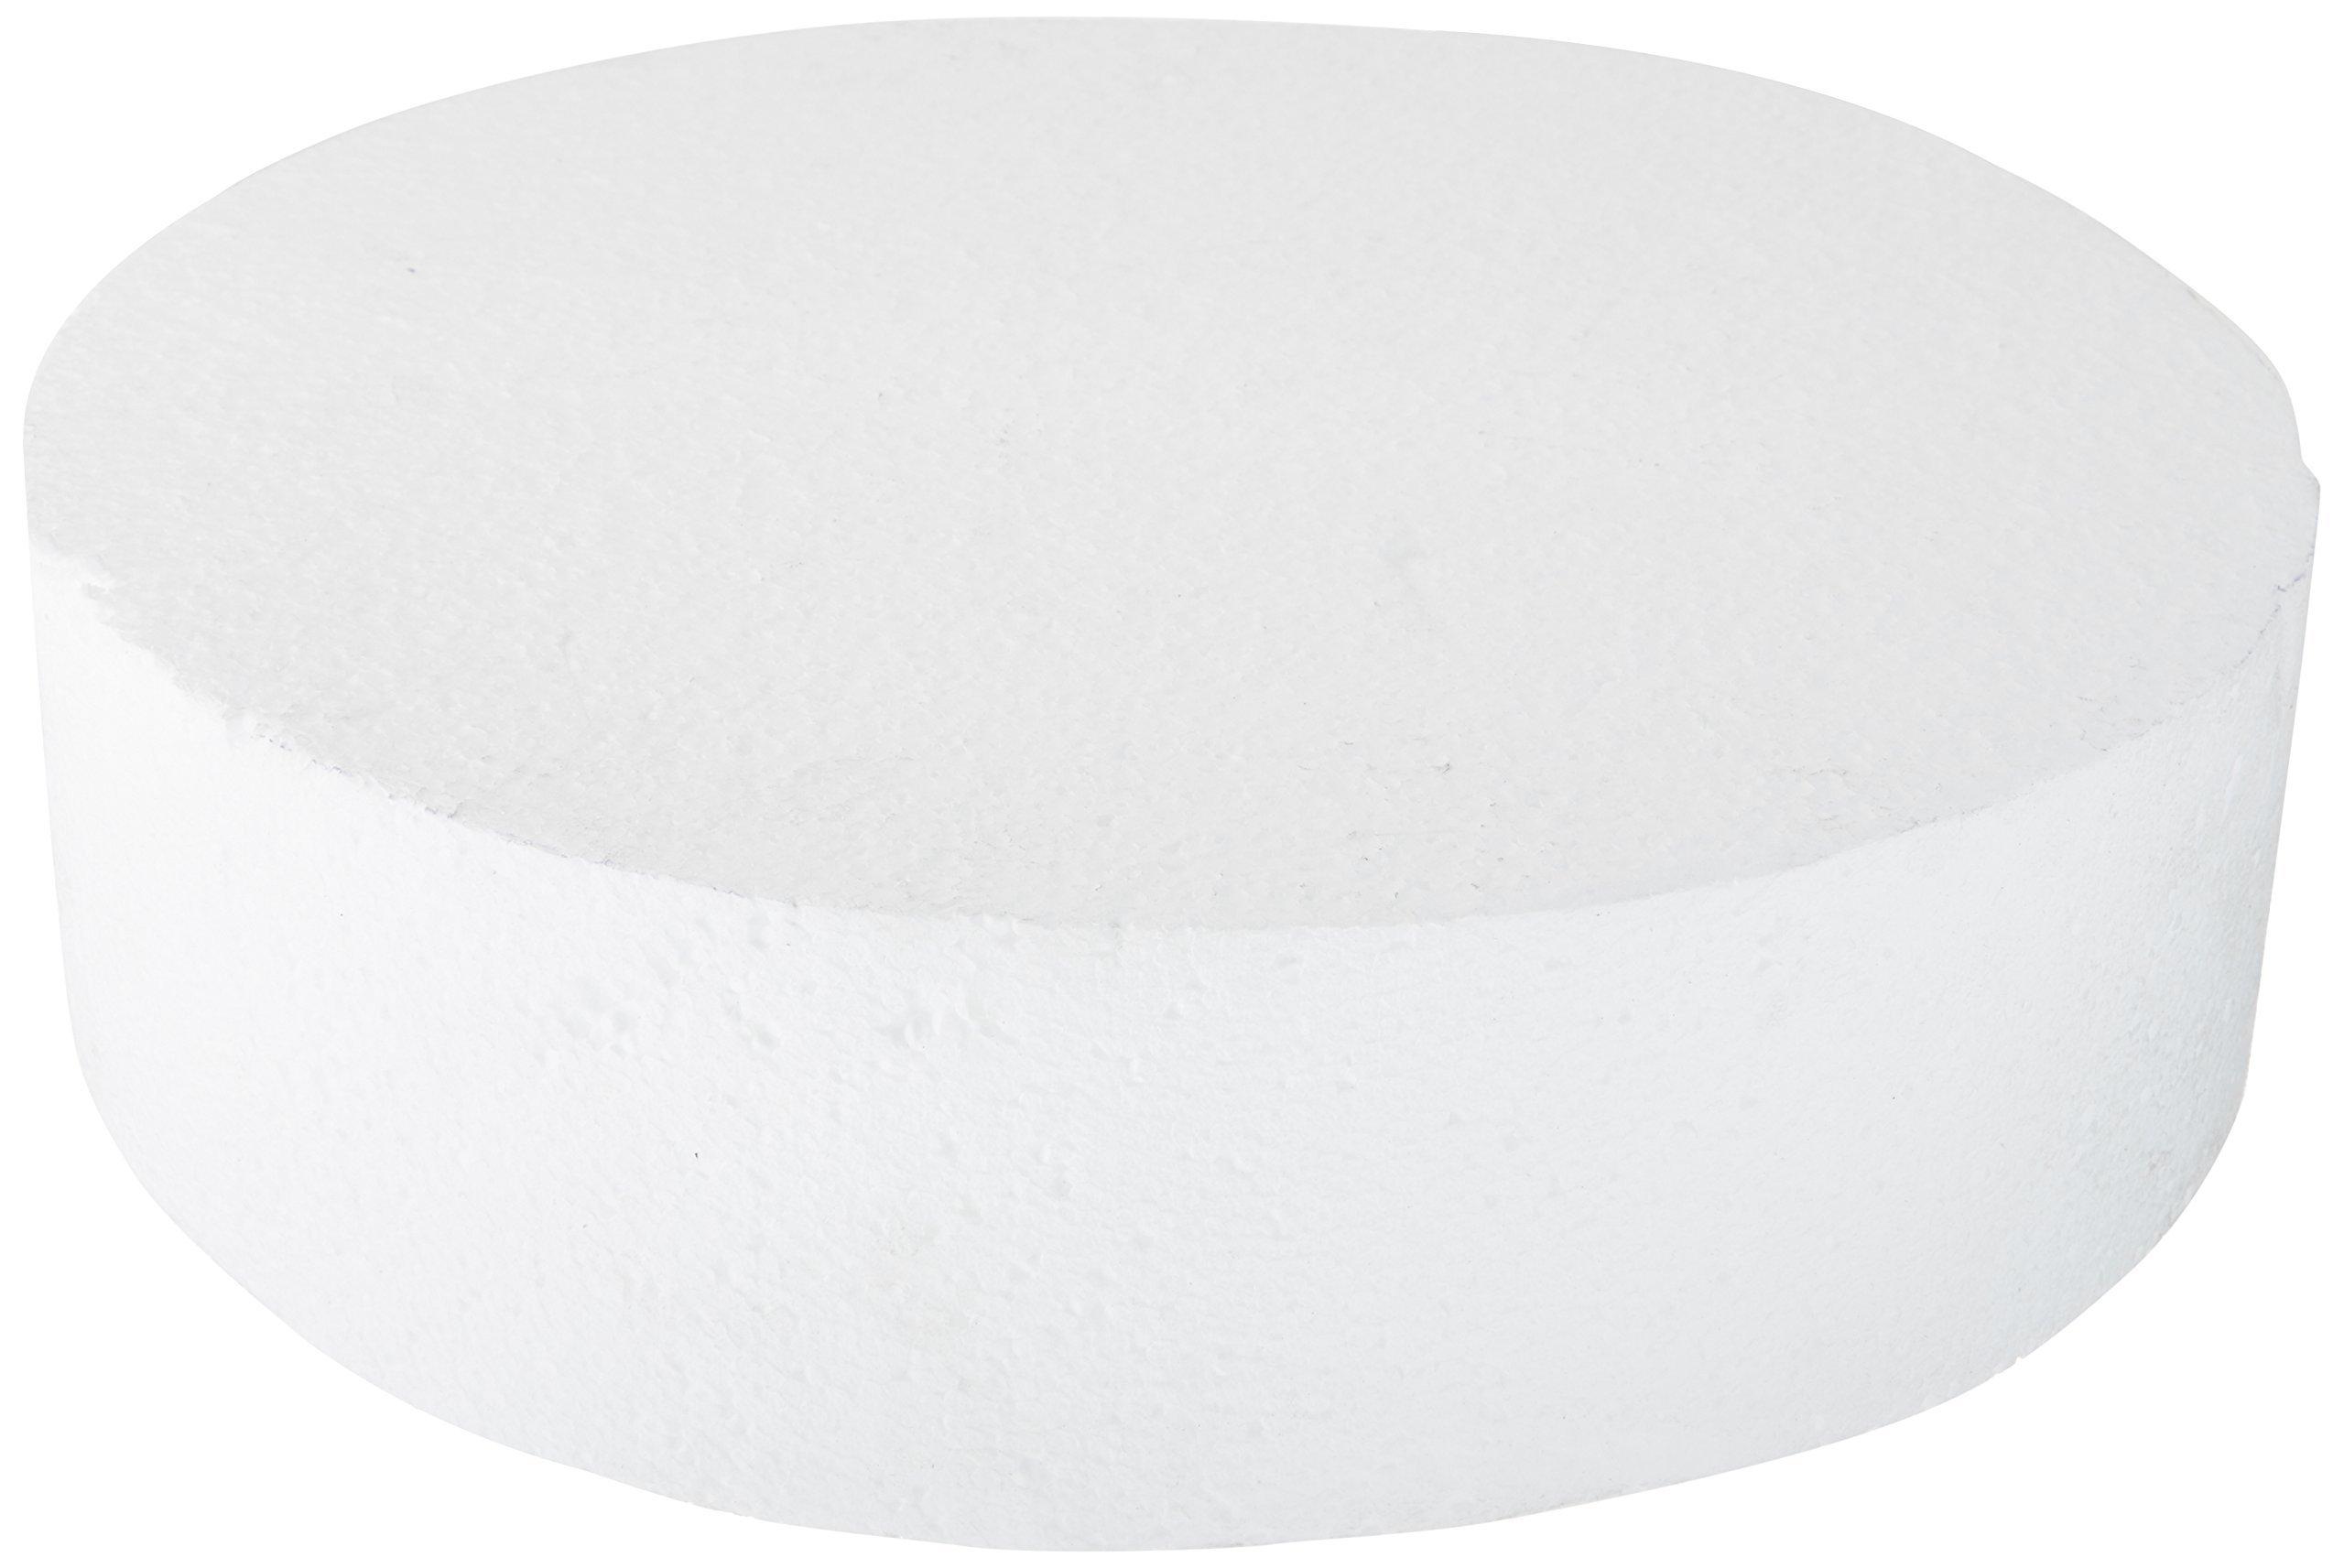 Oasis Supply 747064 Dummy Round Cake, 14'' x 4'', White